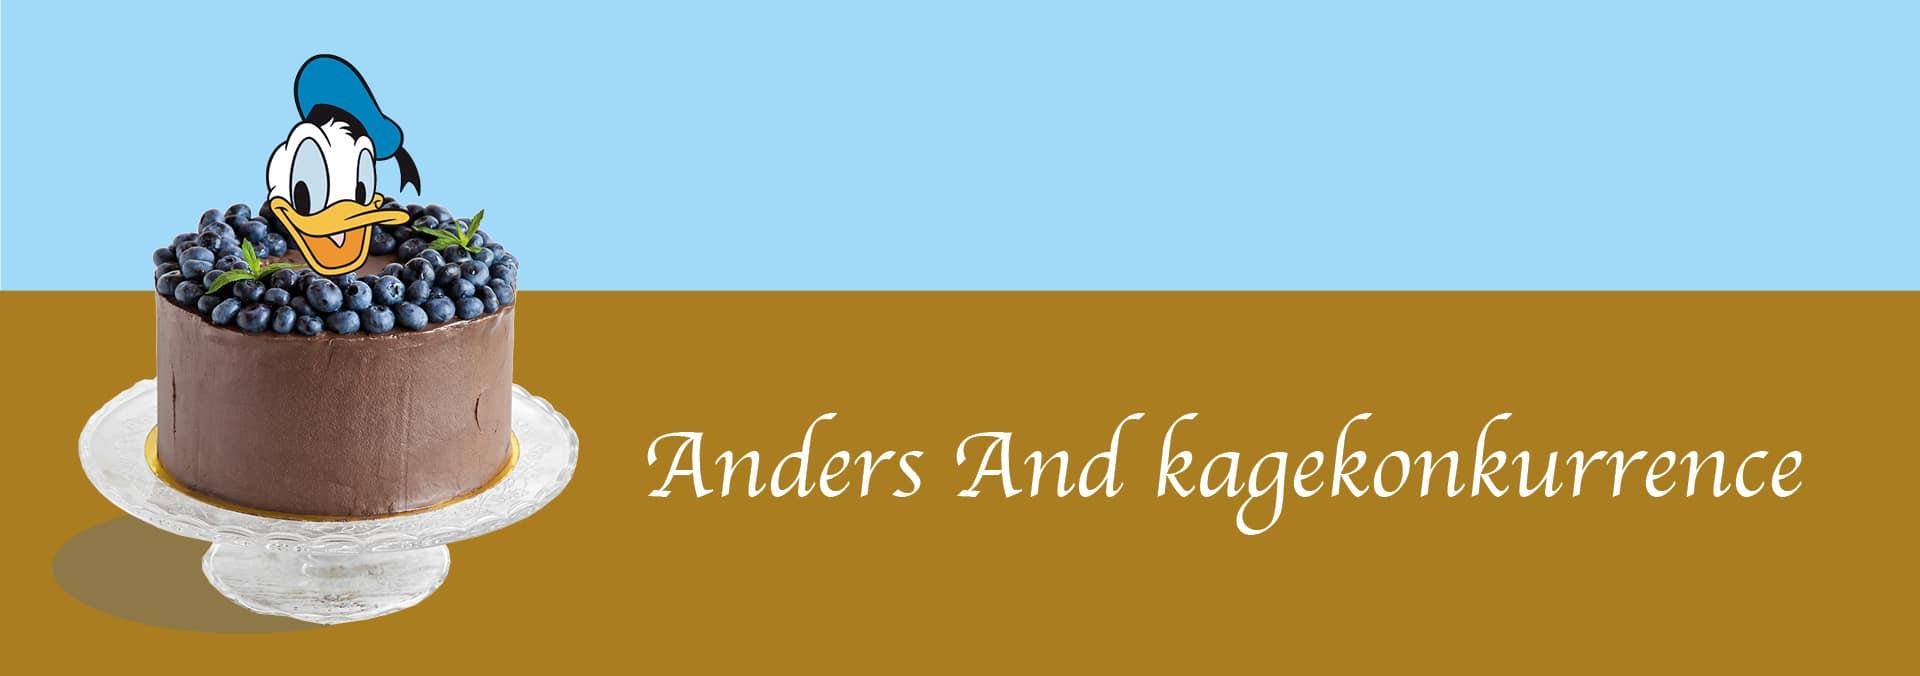 Kagekonkurrence – Bag din egen Anders And kage